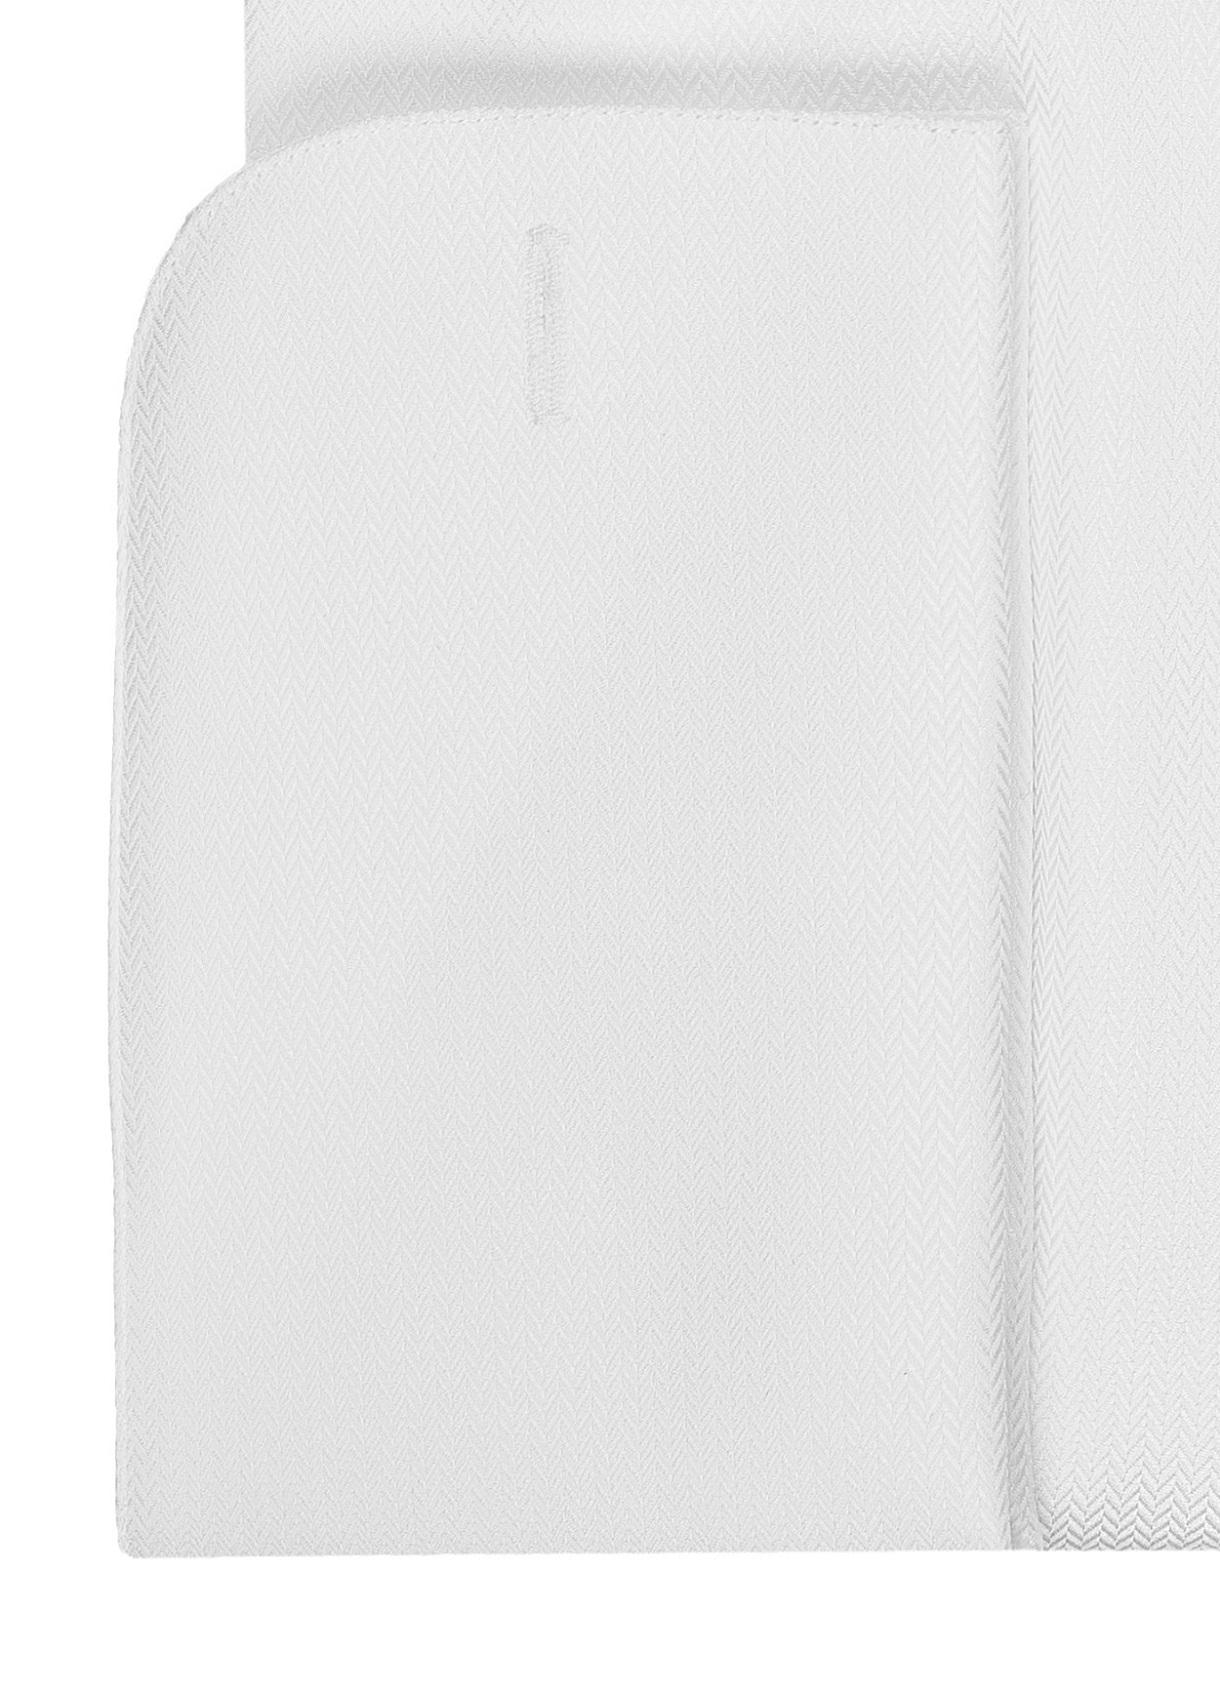 Bradley White Dress Shirt - Double Cuff